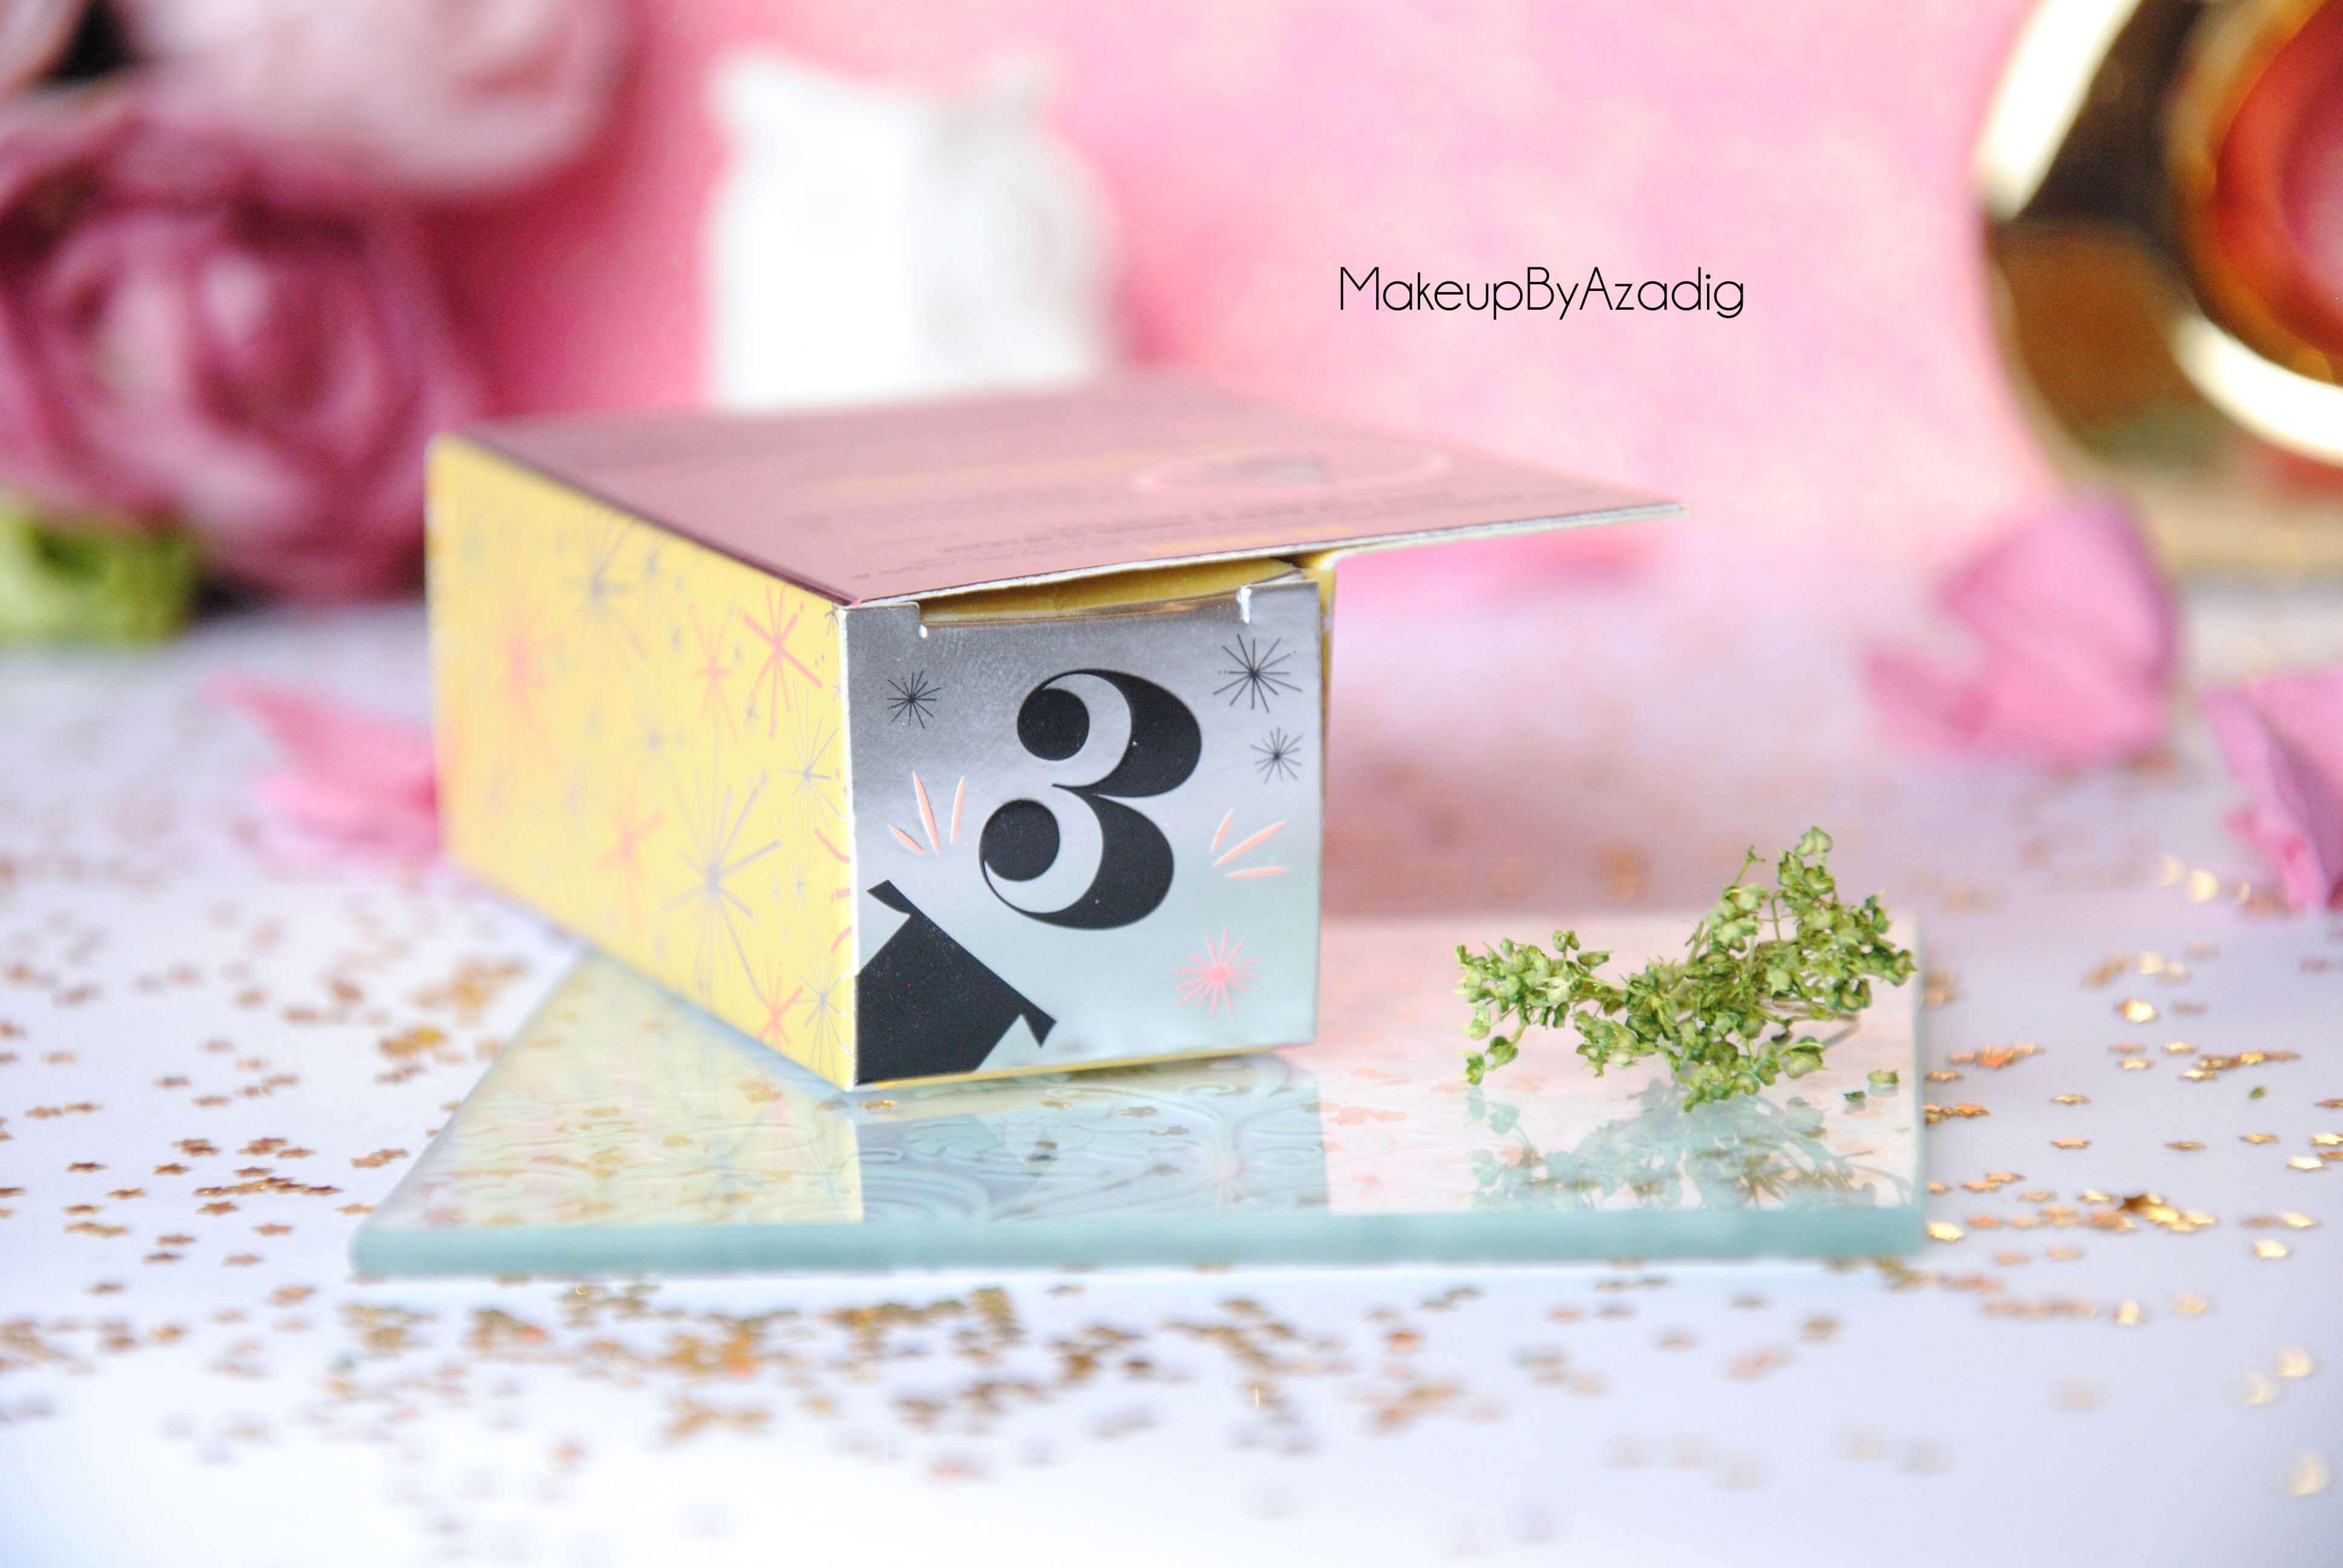 ka-brow-gel-creme-coloration-sourcils-benefit-makeupbyazadig-paris-blog-revue-avis-prix-enjoyphoenix-3